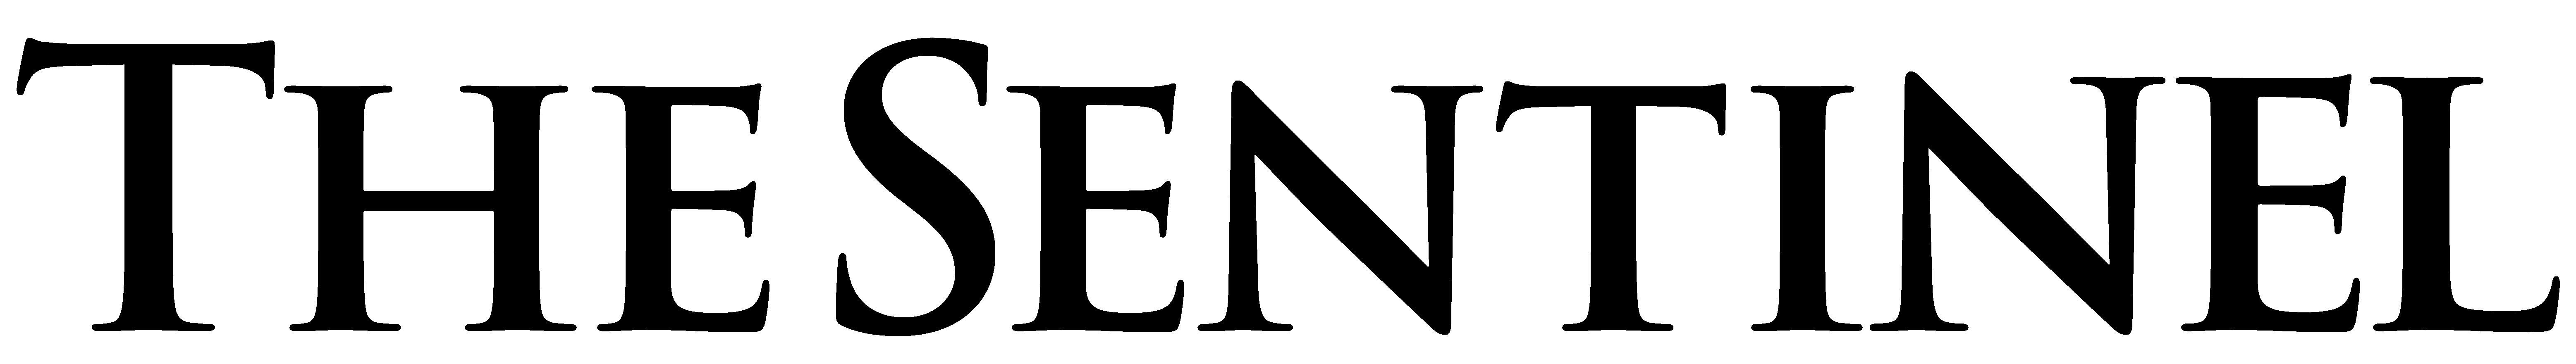 Clipart football punter black and white jpg transparent download Buffalo Bills sign former Seahawks punter Jon Ryan | Professional ... jpg transparent download